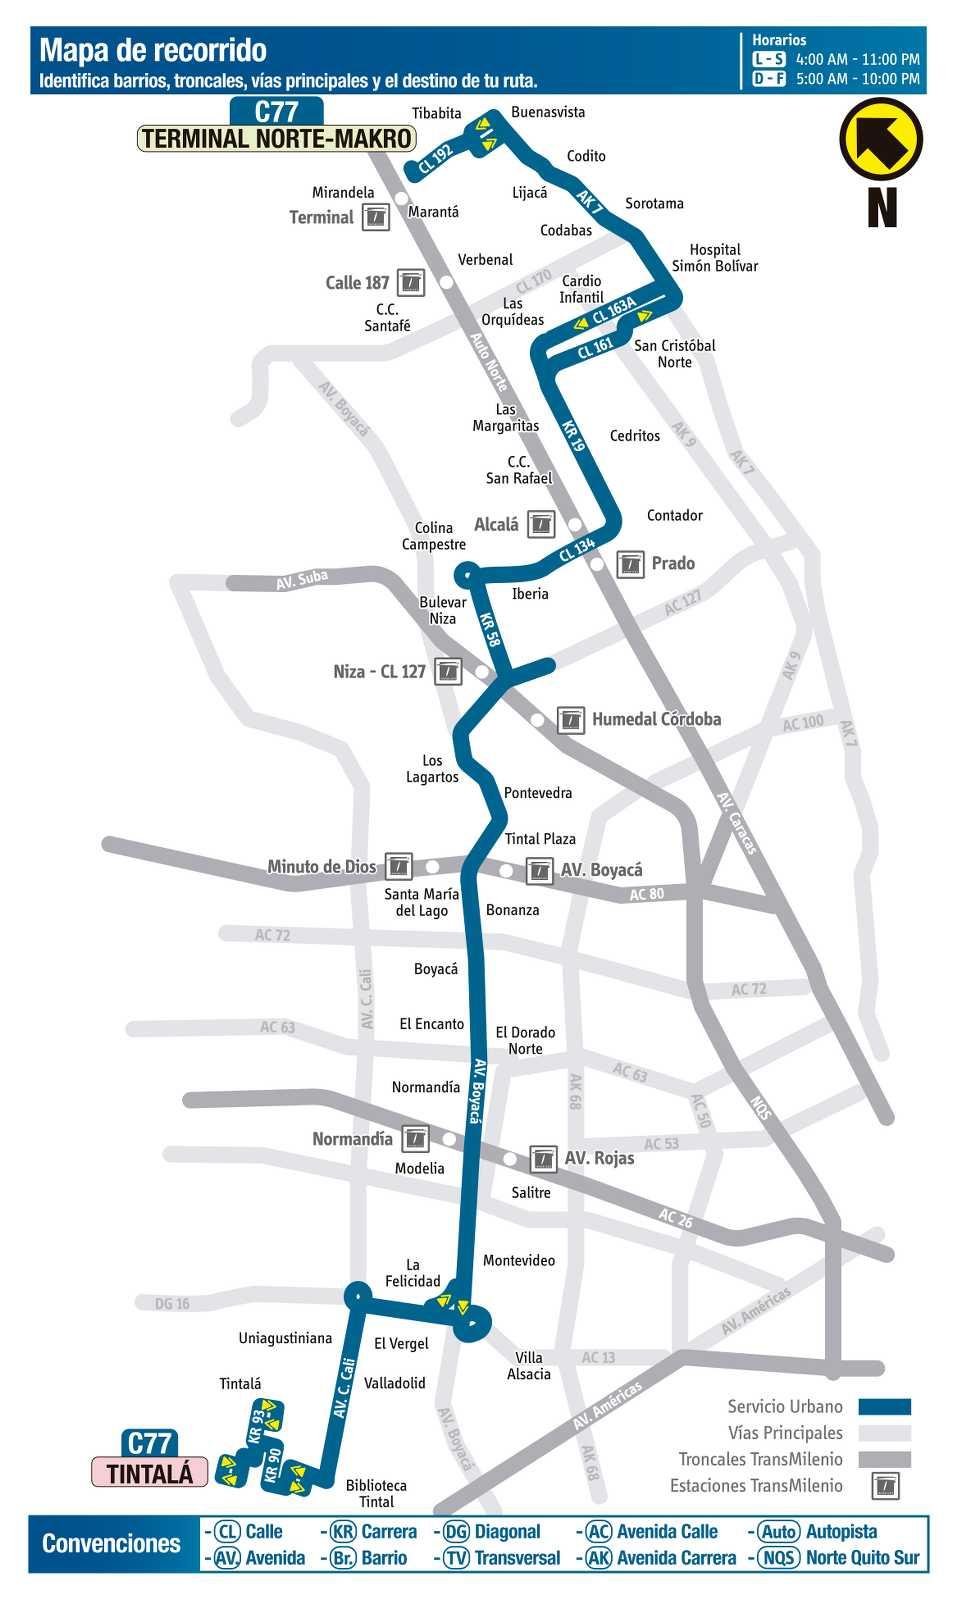 Ruta SITP: C77 > Terminal Norte (Makro) ↔ Tintalá (mapa)